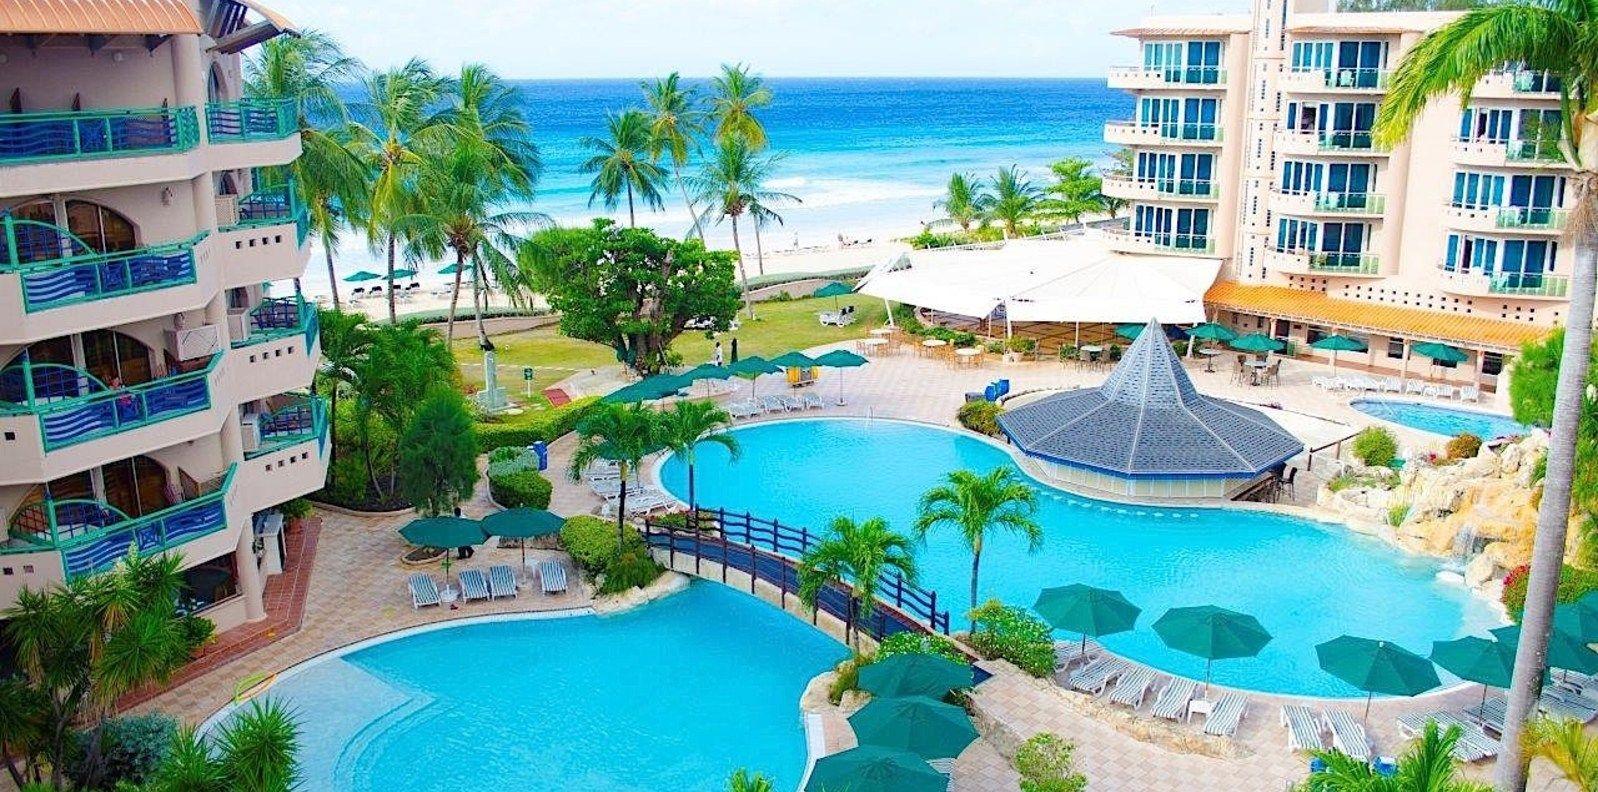 Barbados beach hotels accra beach hotel rockley beach